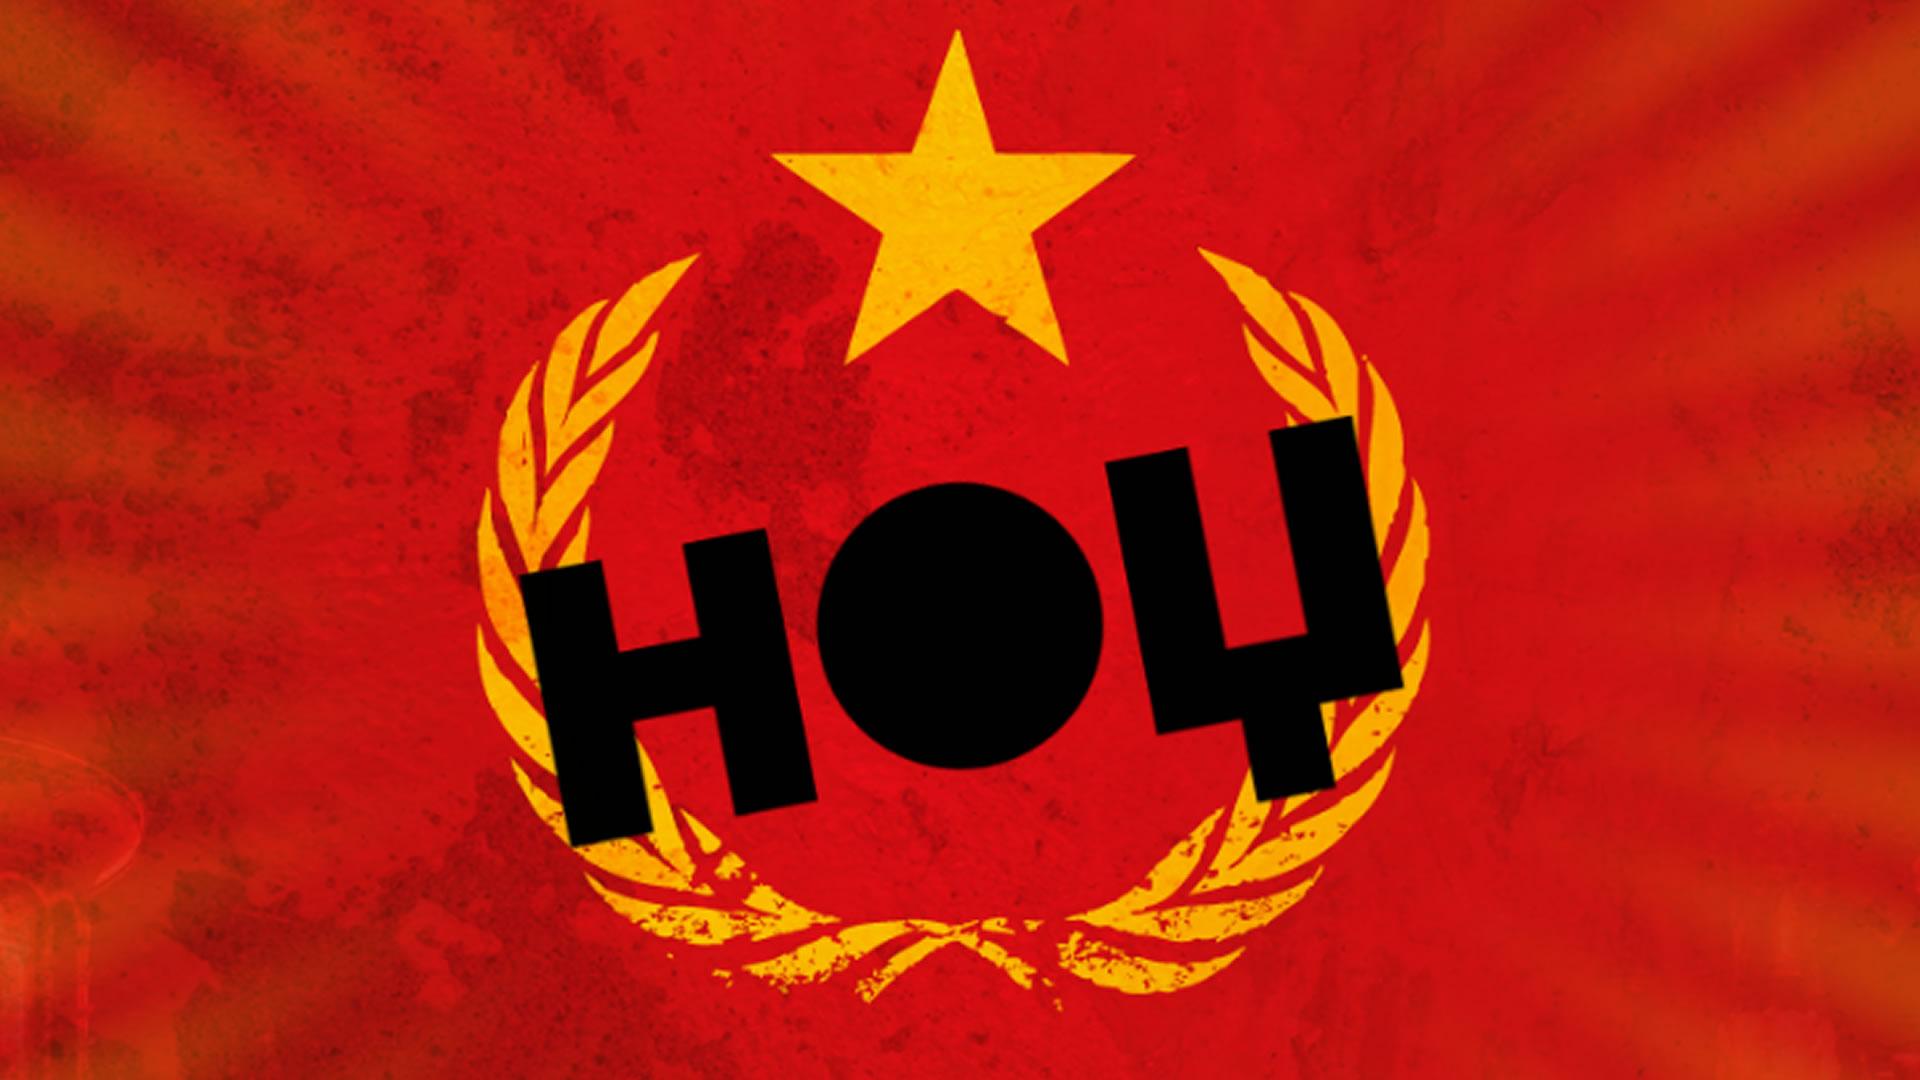 HOY ! – Le Post Mortem